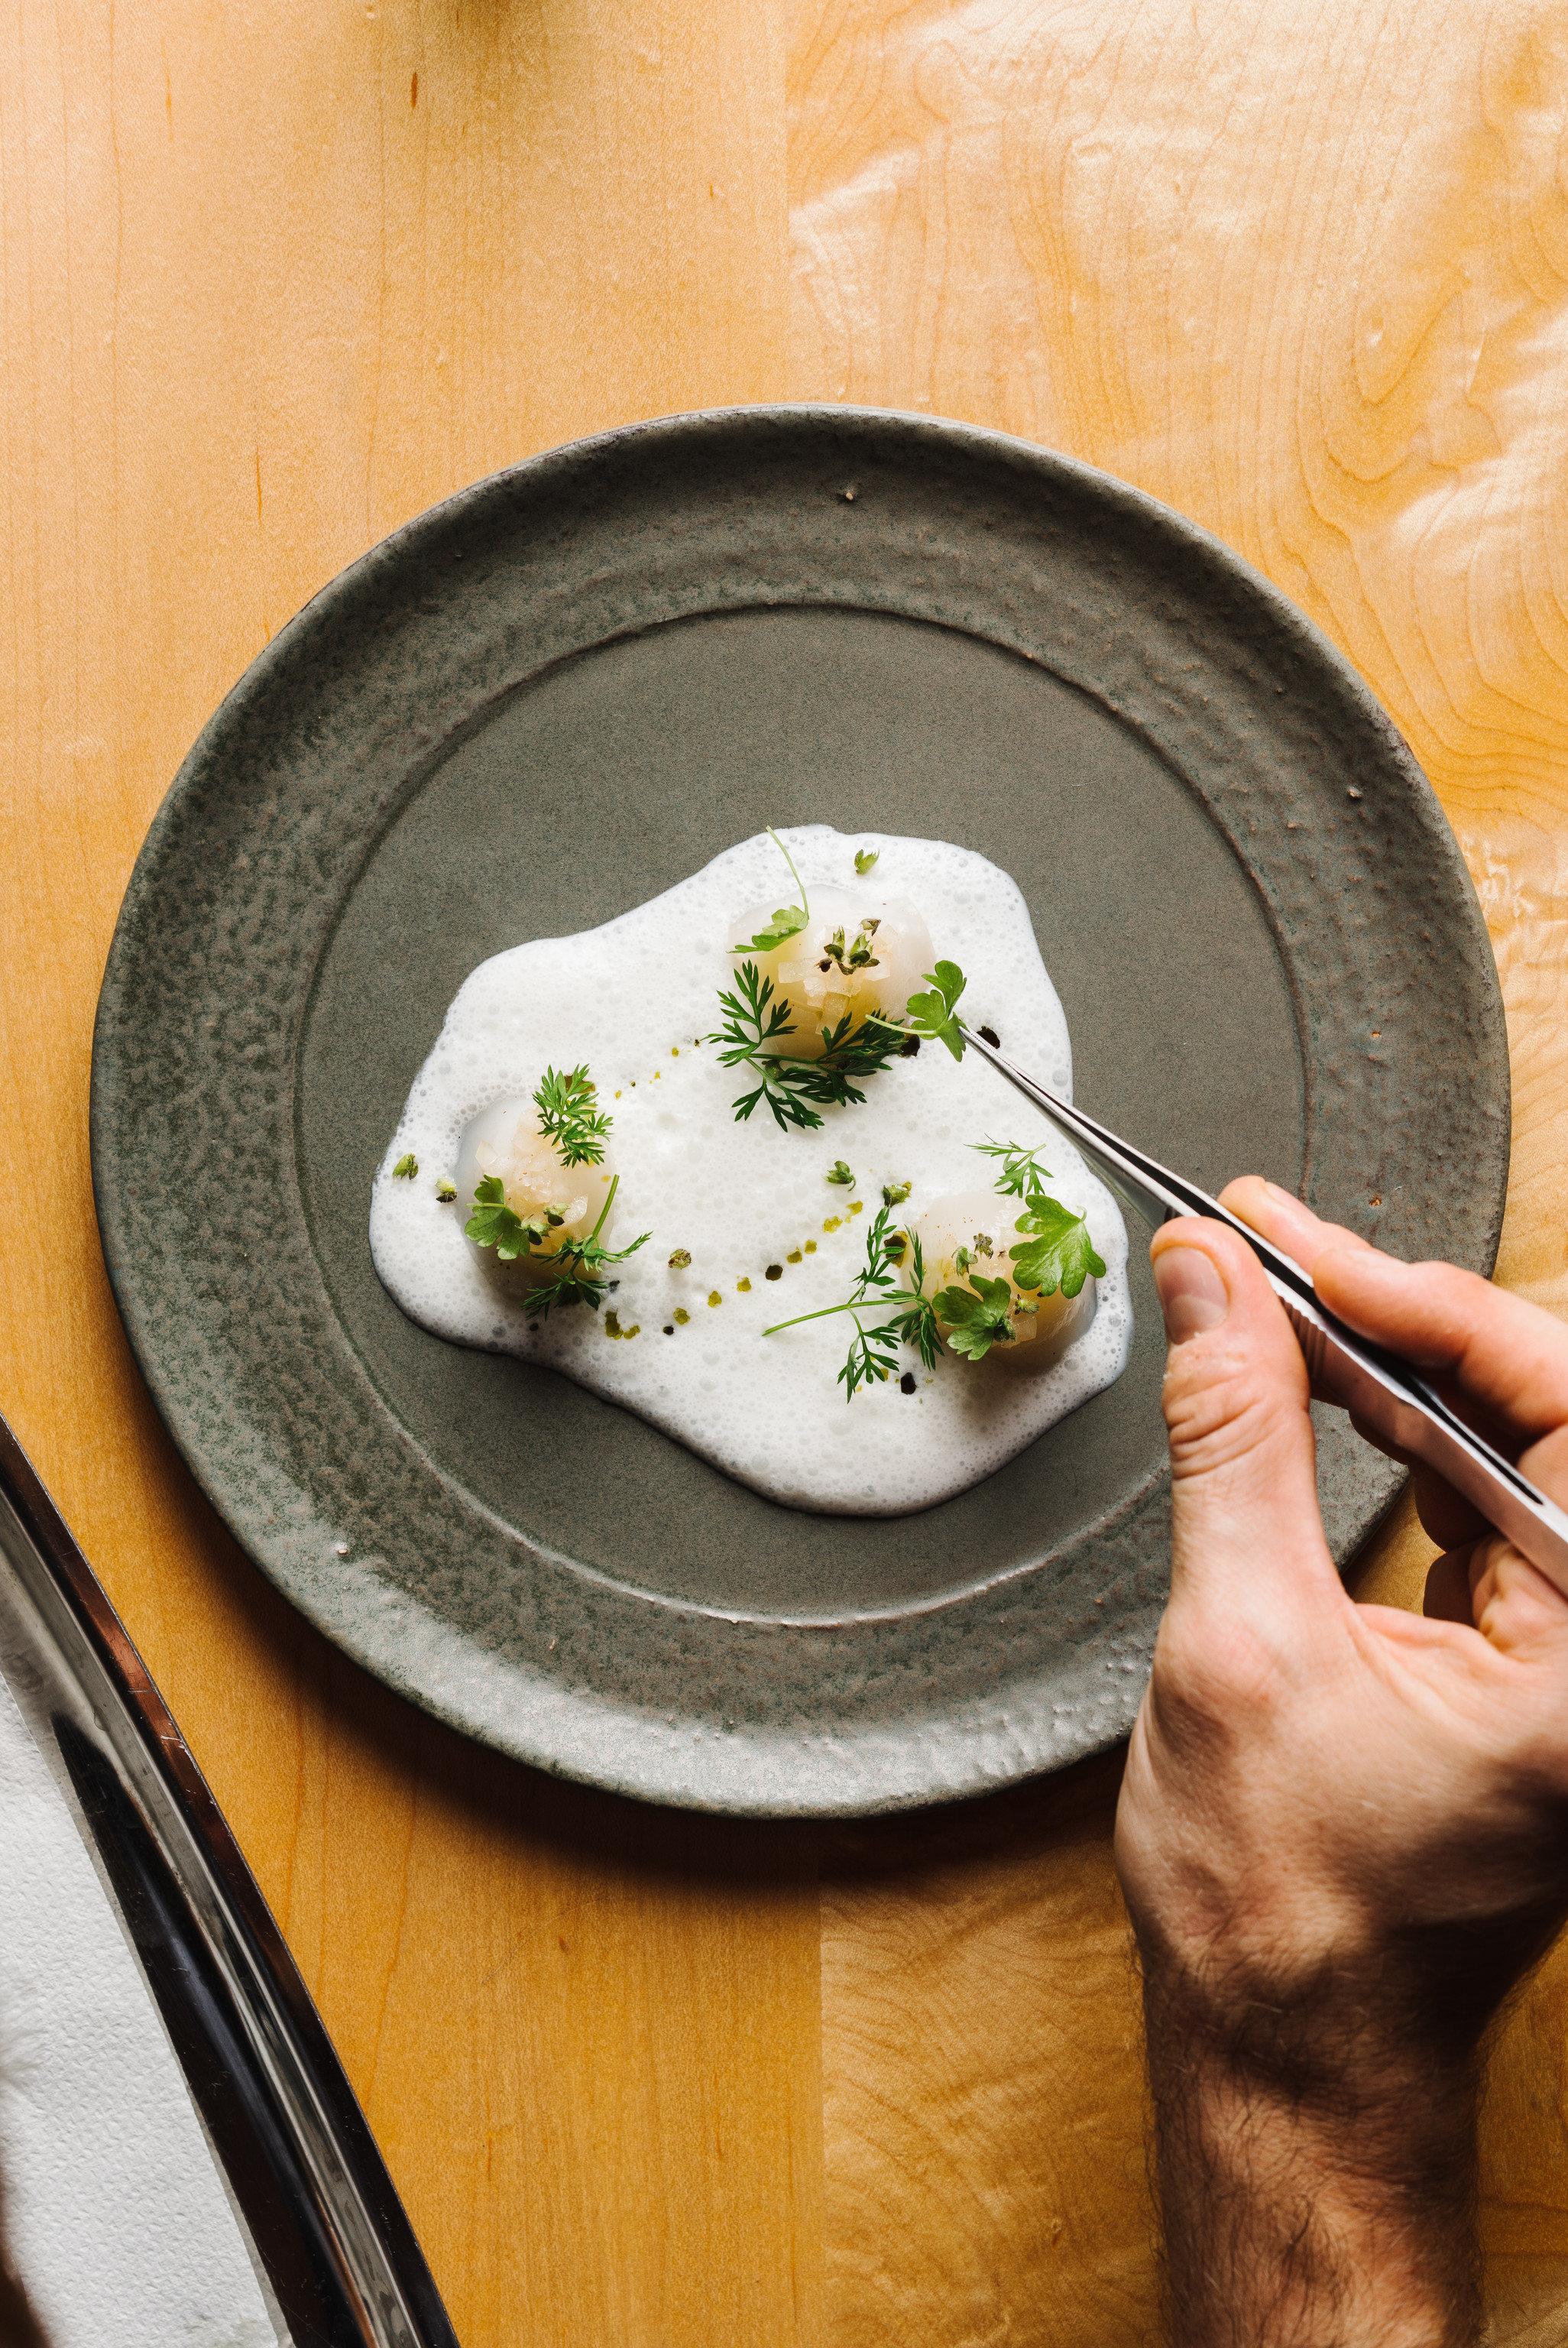 Jetsetter Guides dish food produce vegetable breakfast meal cuisine